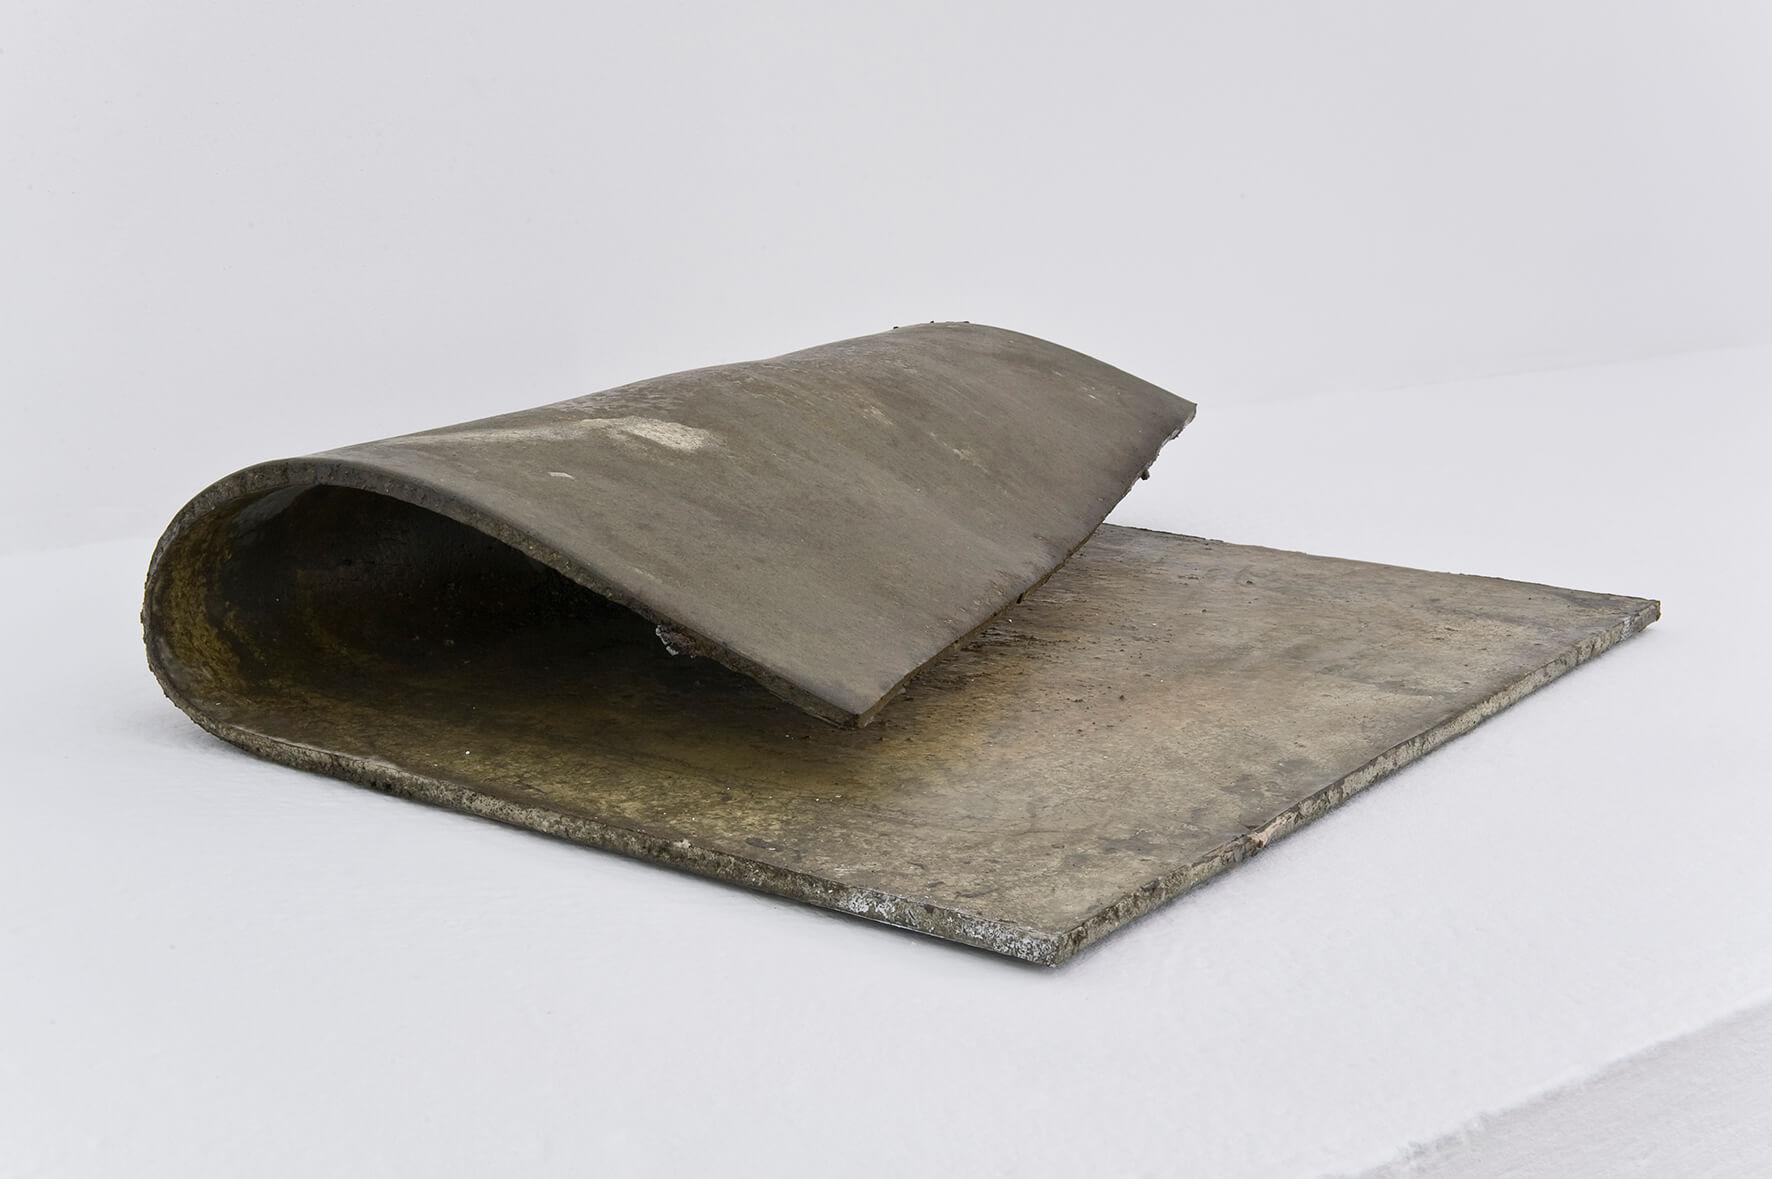 Untitled (Wachsfaltung), 2012 | 10, 25, 80 | ProjecteSD